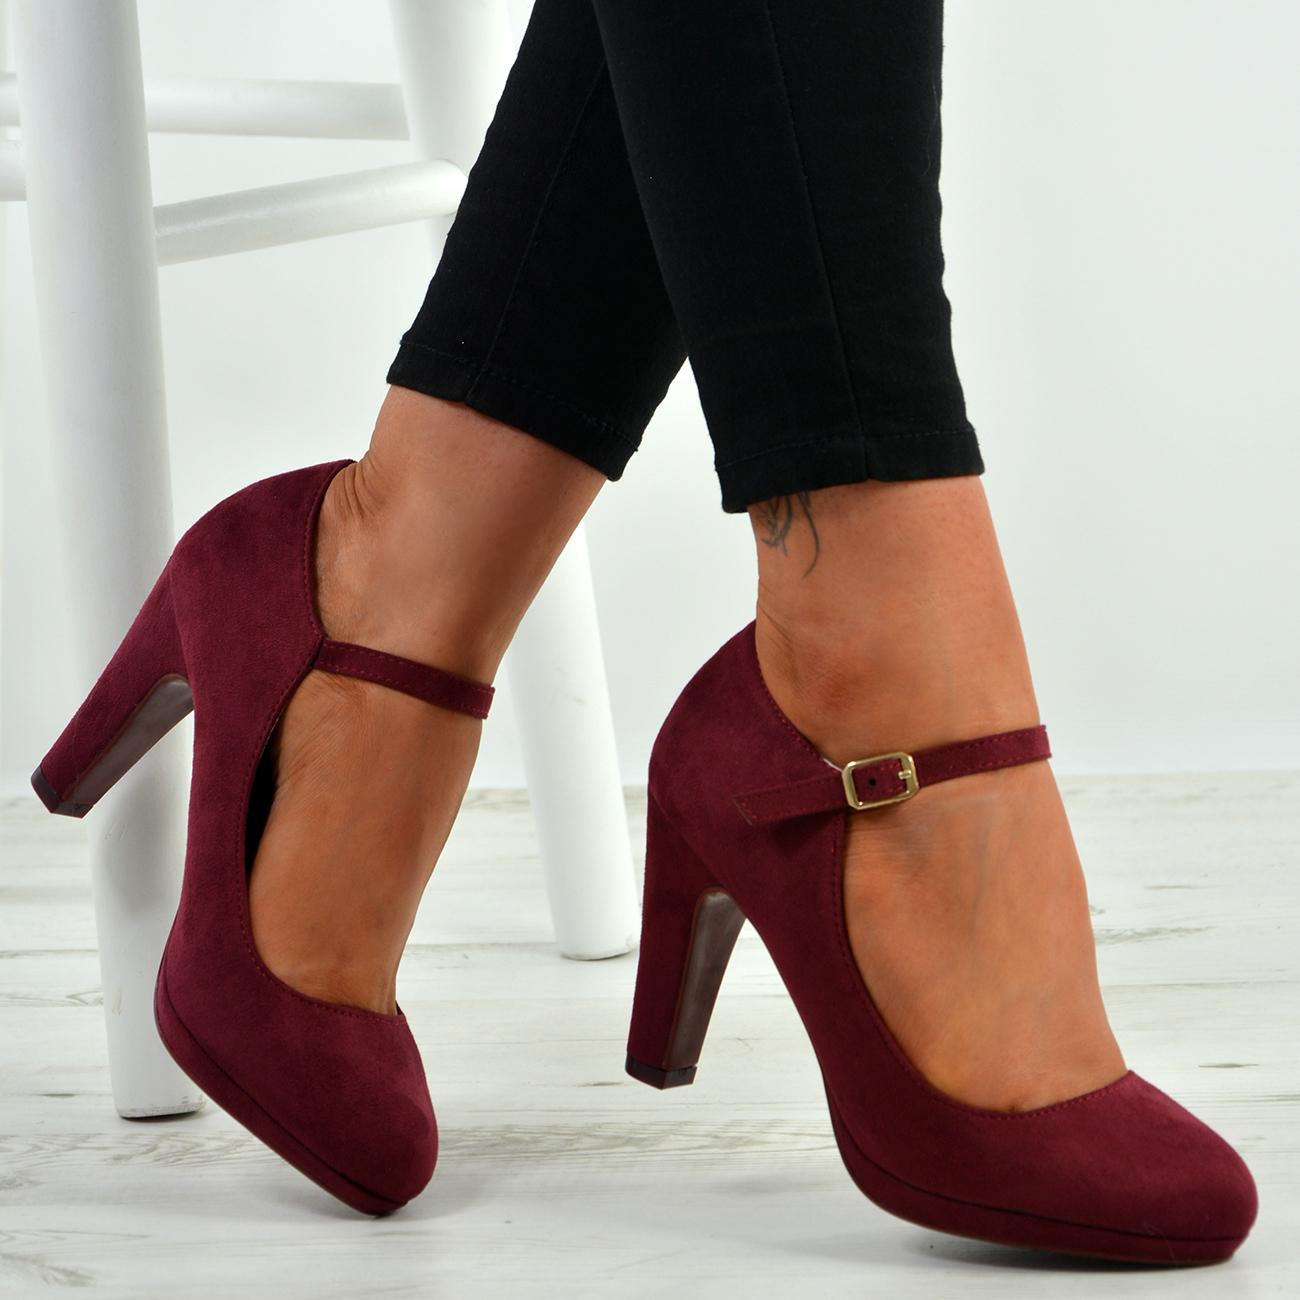 New Womens Ankle Strap Pumps Ladies High Block Heel Buckle ...